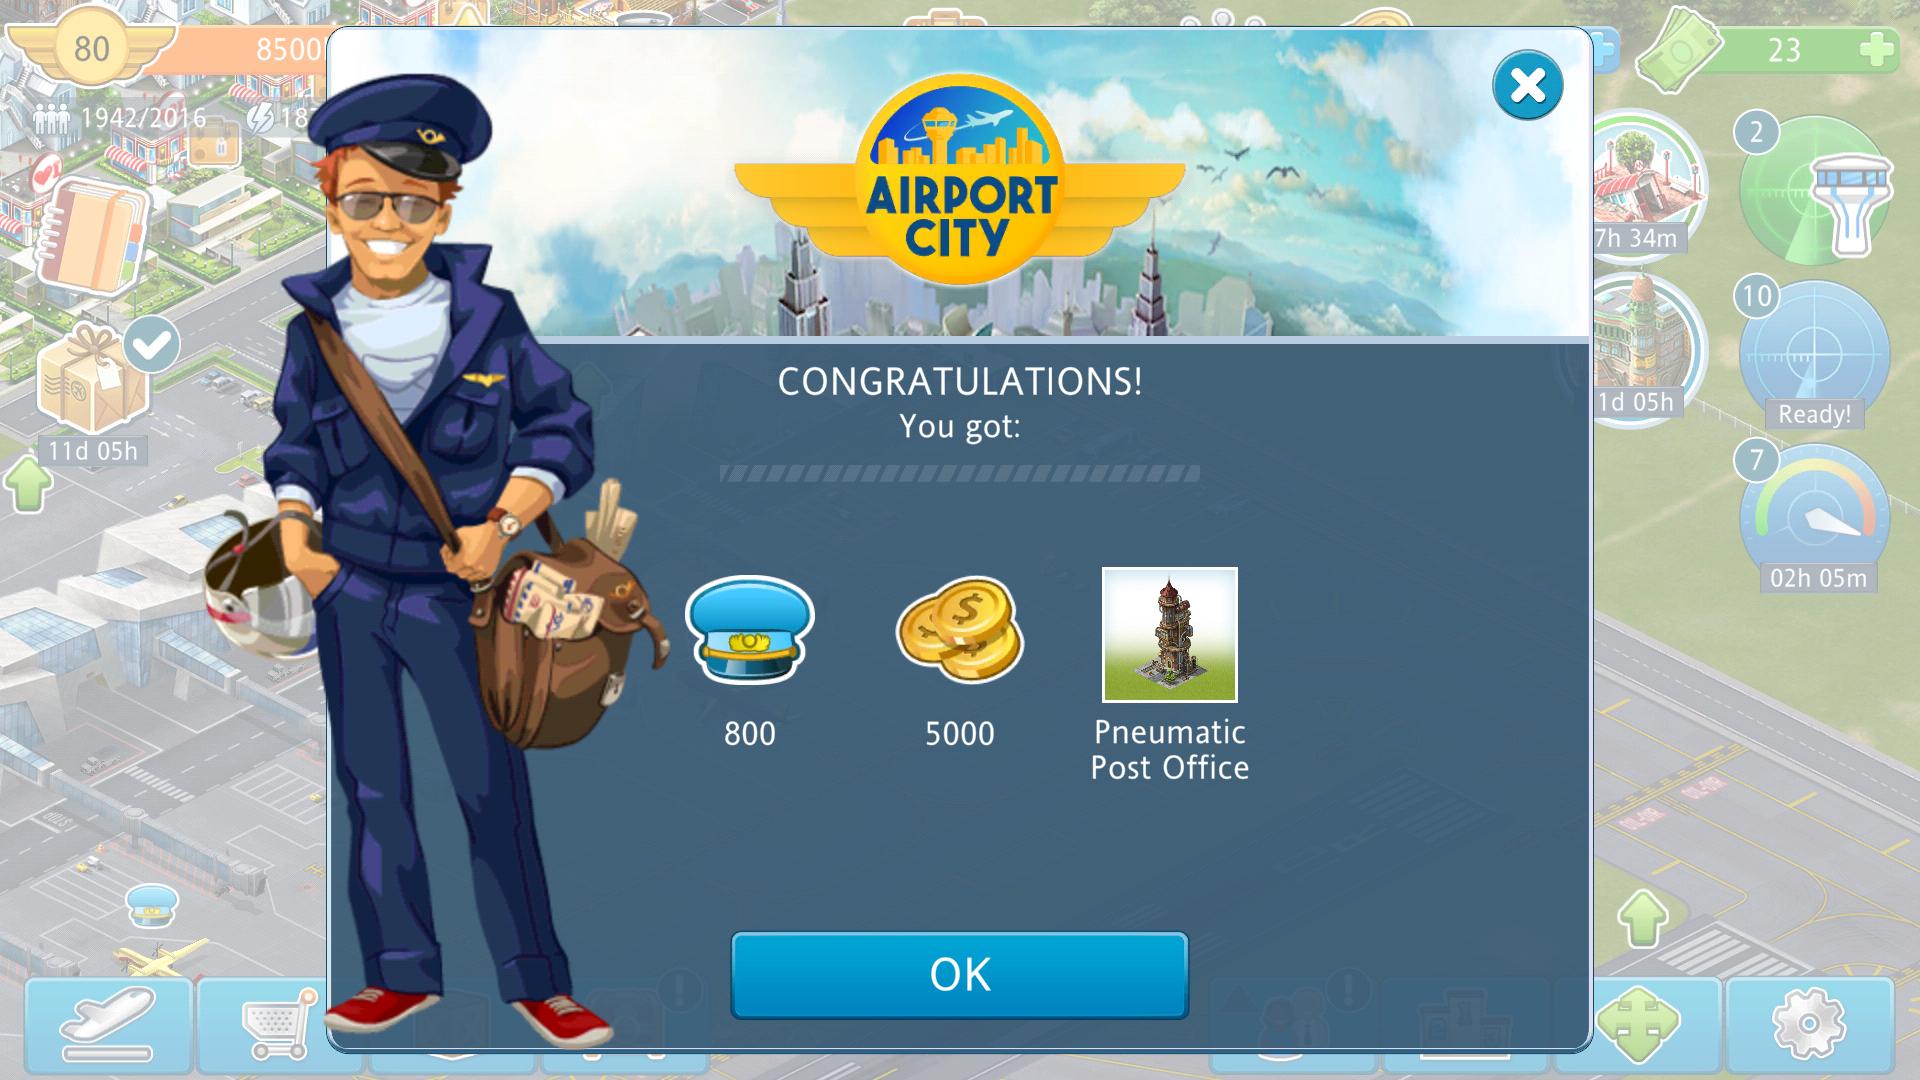 Screenshot_2020-03-25-21-25-23-483_com.gameinsight.airport.png